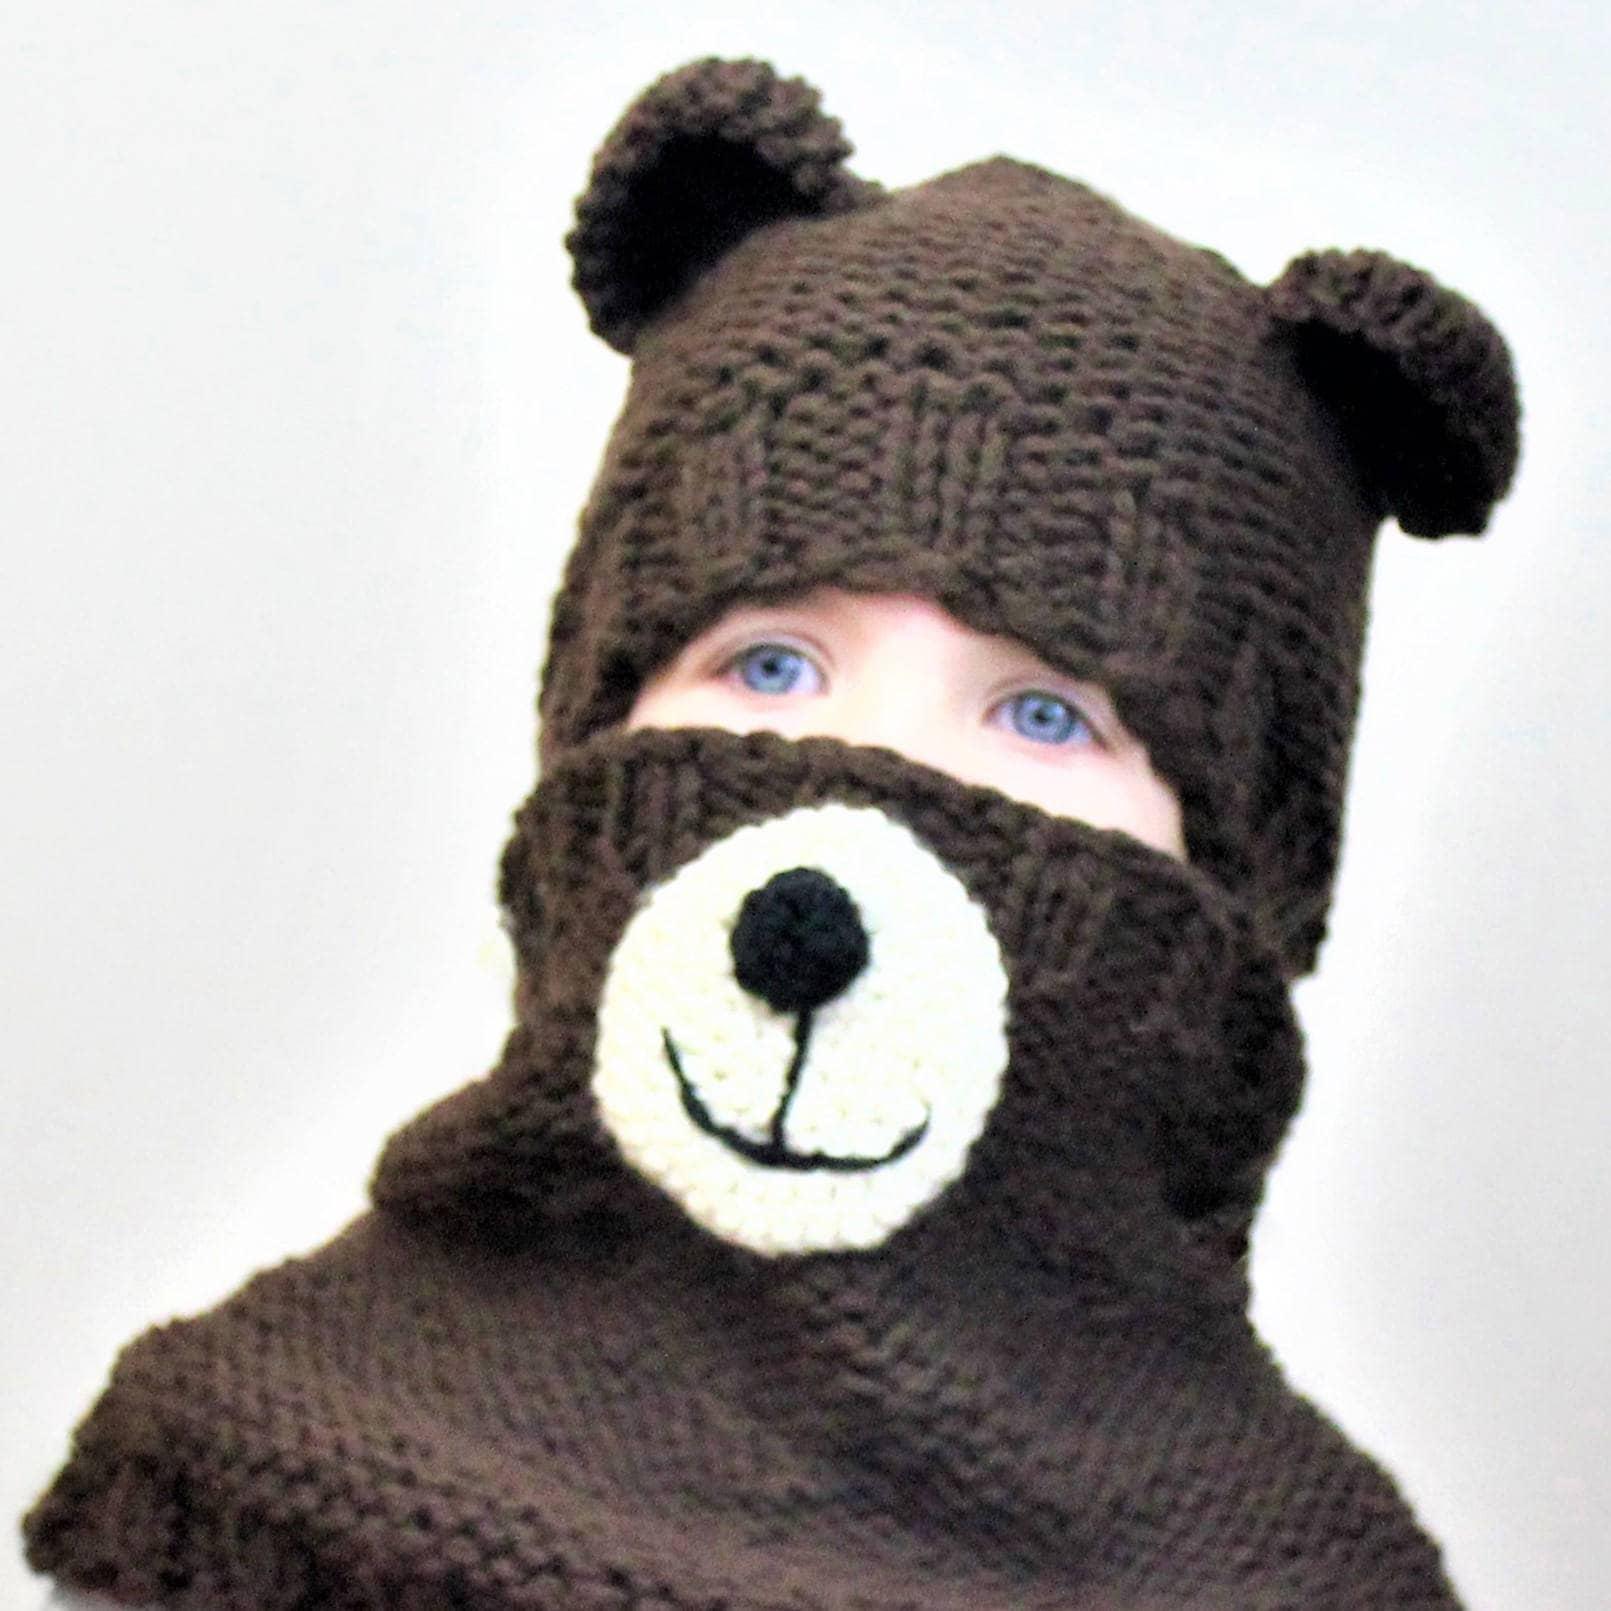 Knitting pattern patron tricot pdf bertie bear set hatcowl this is a digital file bankloansurffo Gallery